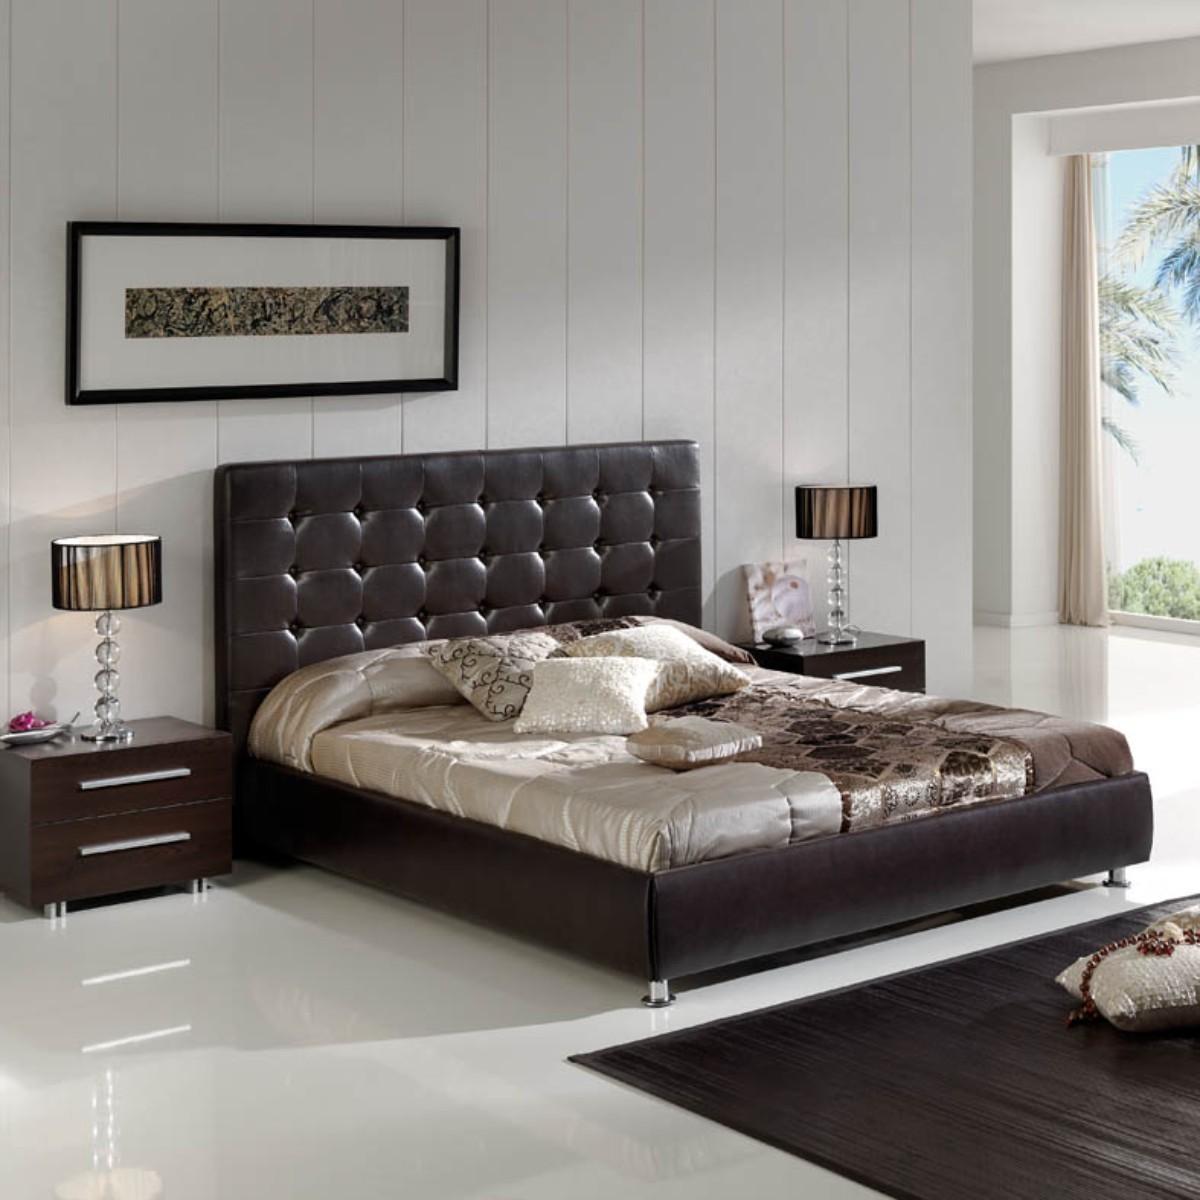 polsterbett casablanca kunstleder braun 180 x 200 cm. Black Bedroom Furniture Sets. Home Design Ideas